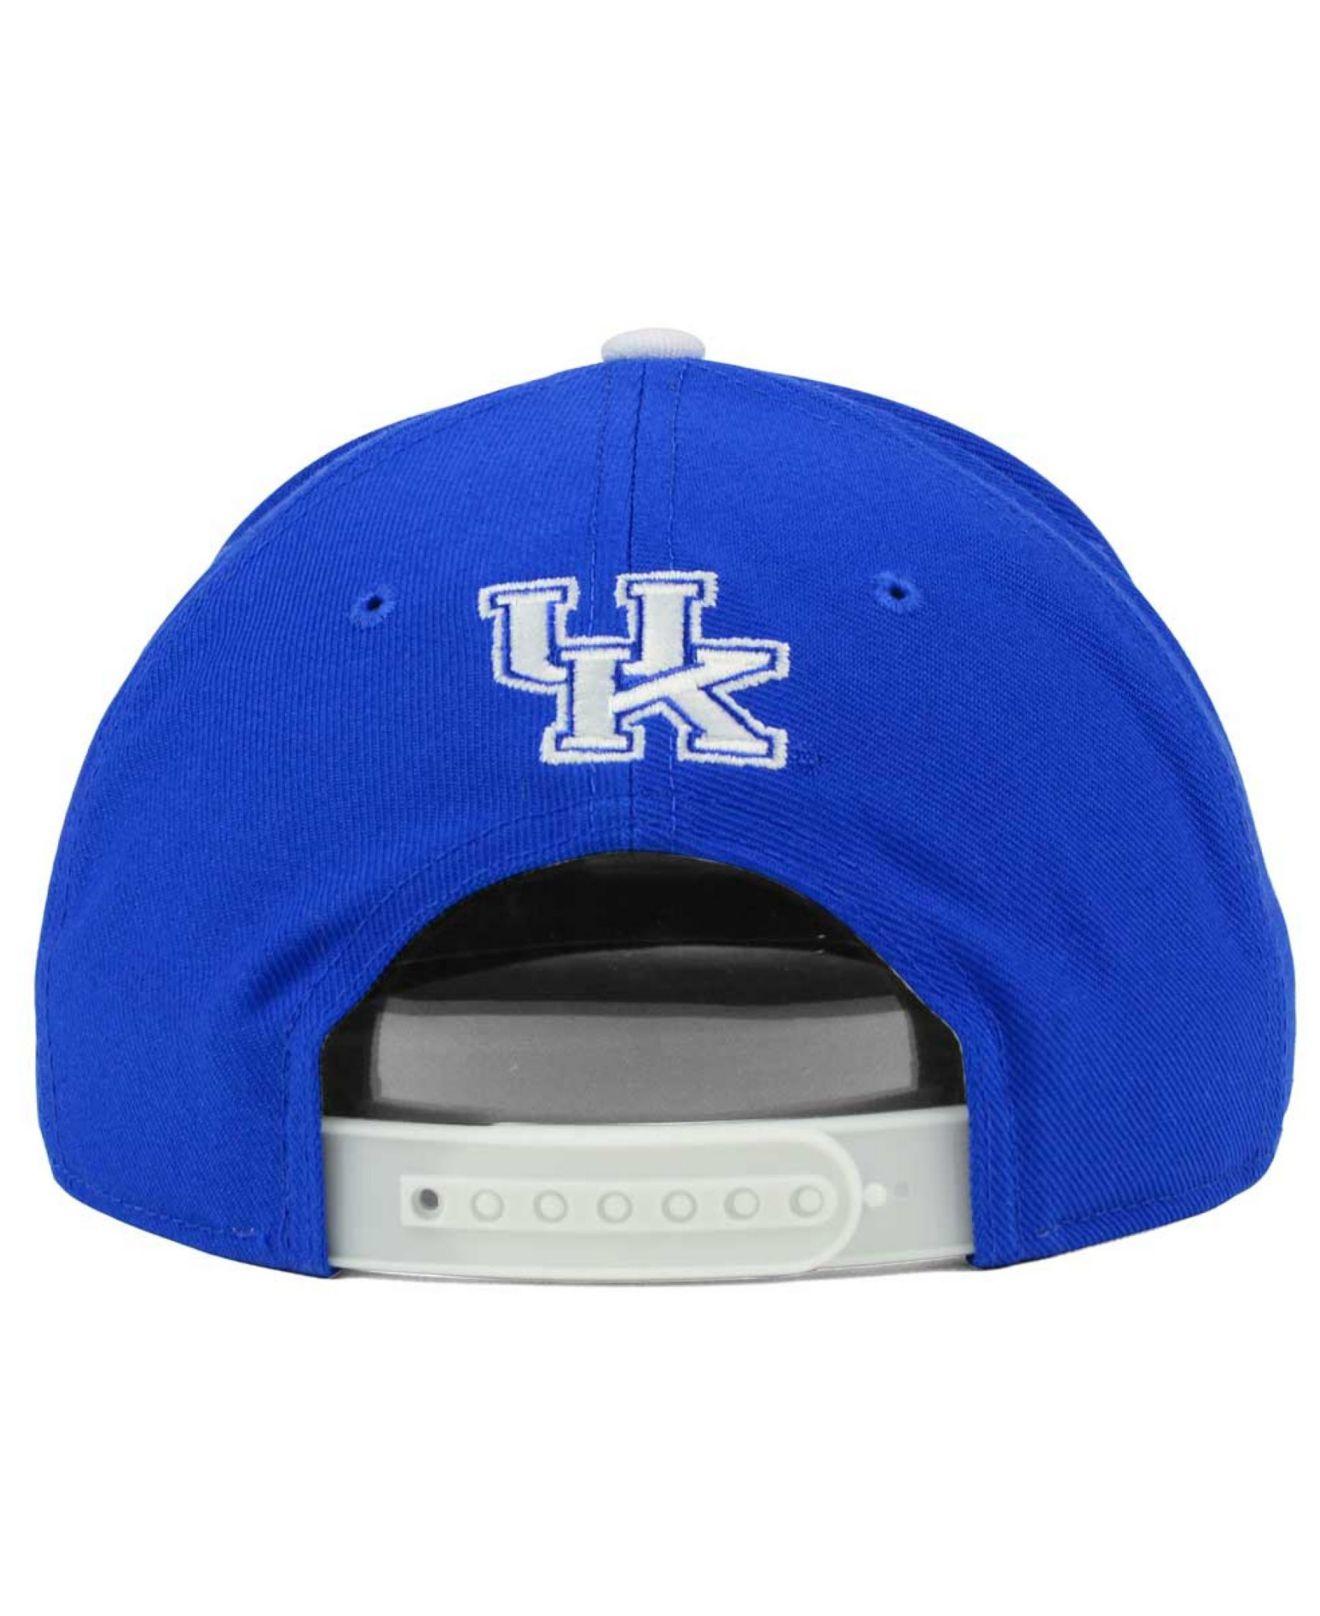 e0b131cd223 ... vapor performance fitted hat 13323 6114b  closeout lyst nike kentucky  wildcats true hardwood seasonal cap in blue for men 53470 4cc40